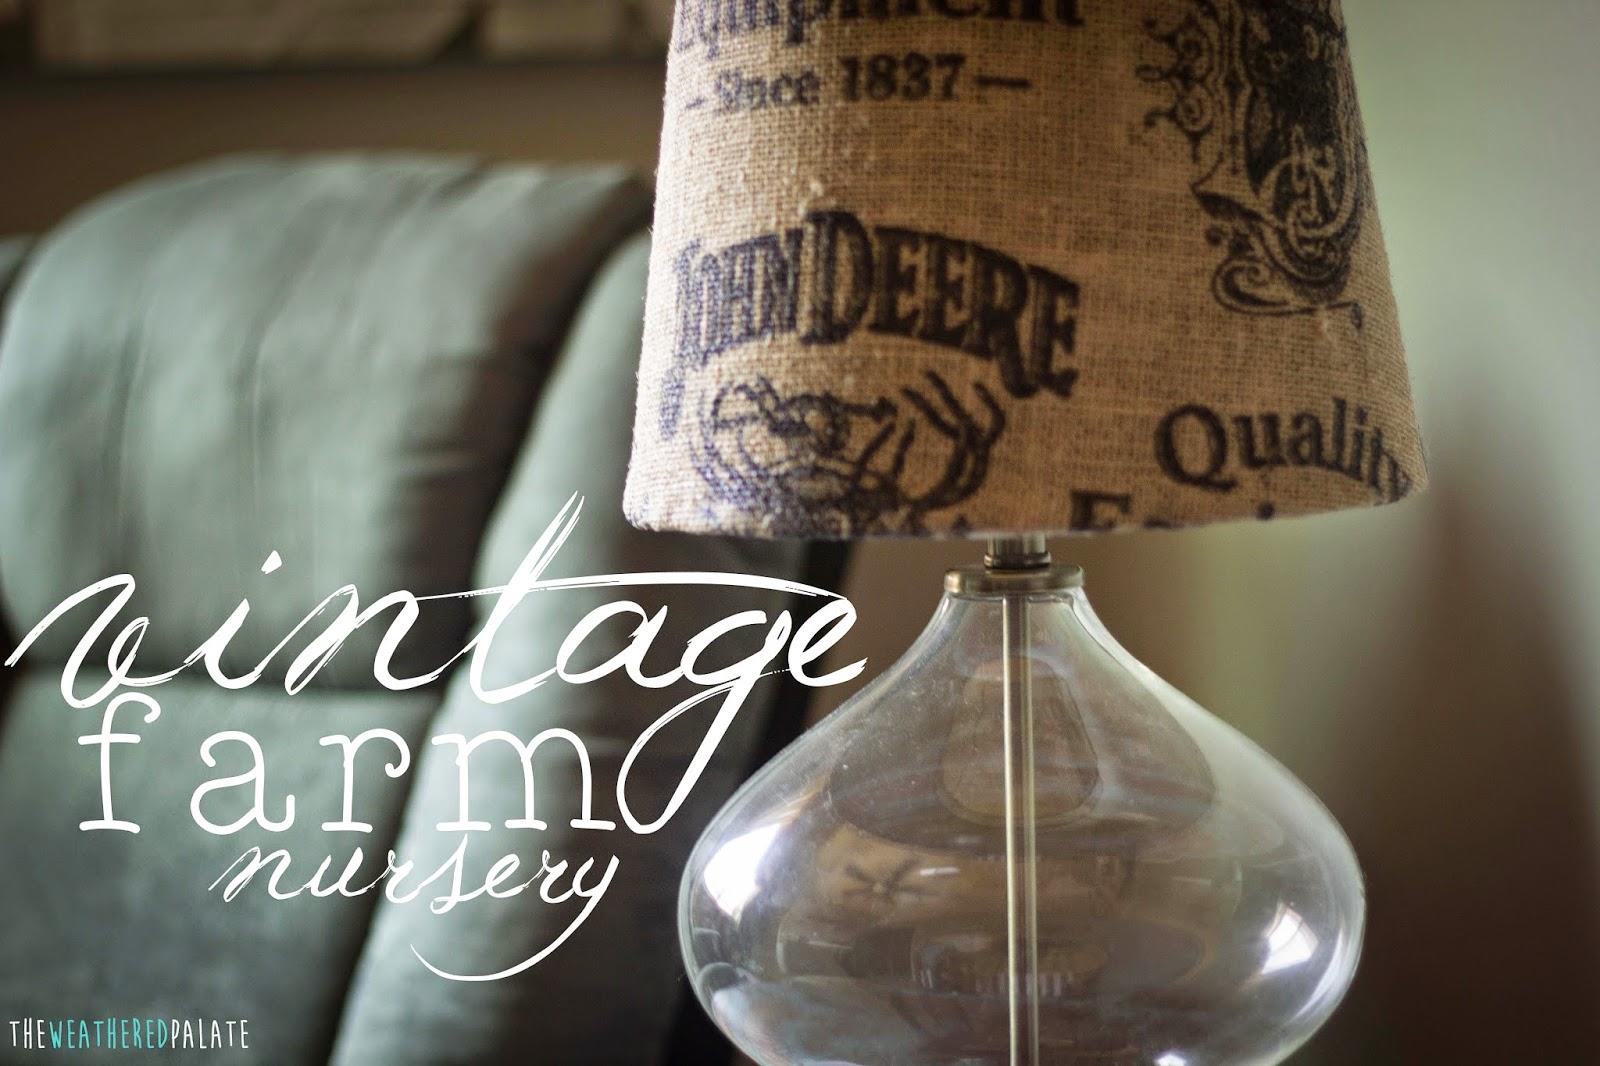 http://www.theweatheredpalate.com/2014/09/vintage-farm-nursery.html